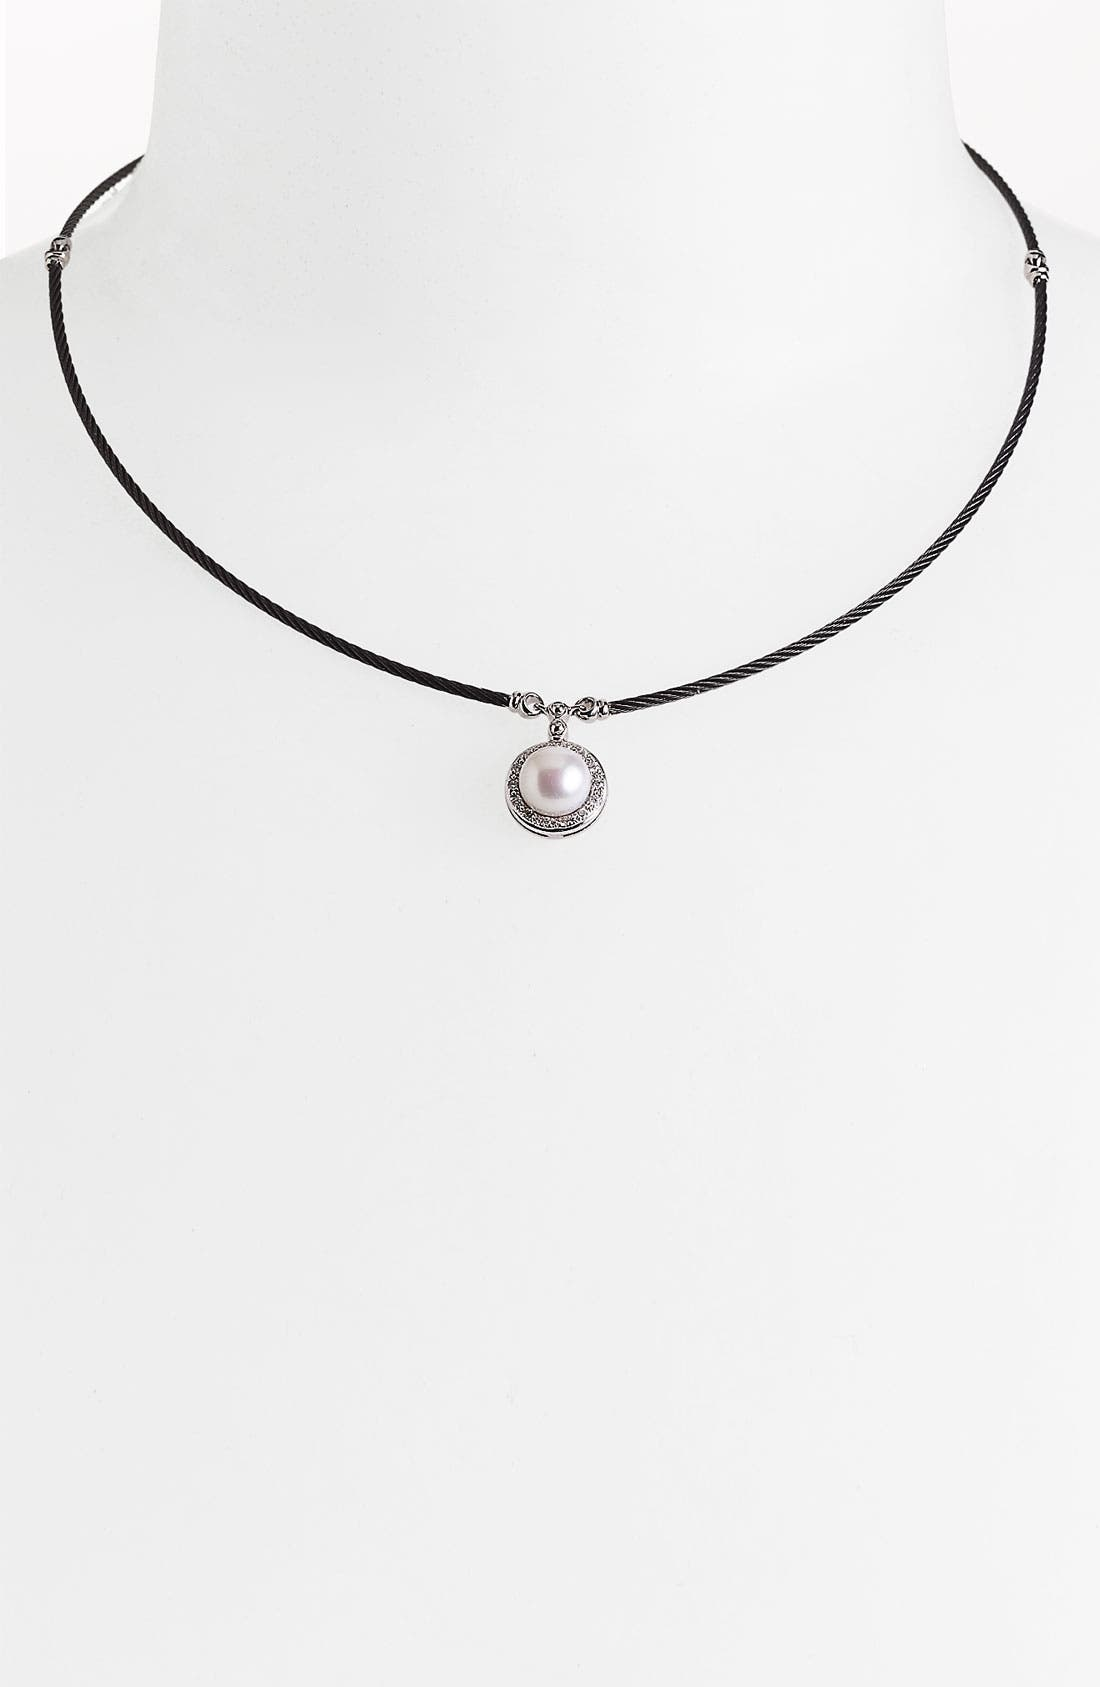 Alternate Image 1 Selected - ALOR® Pearl & Diamond Pendant Necklace